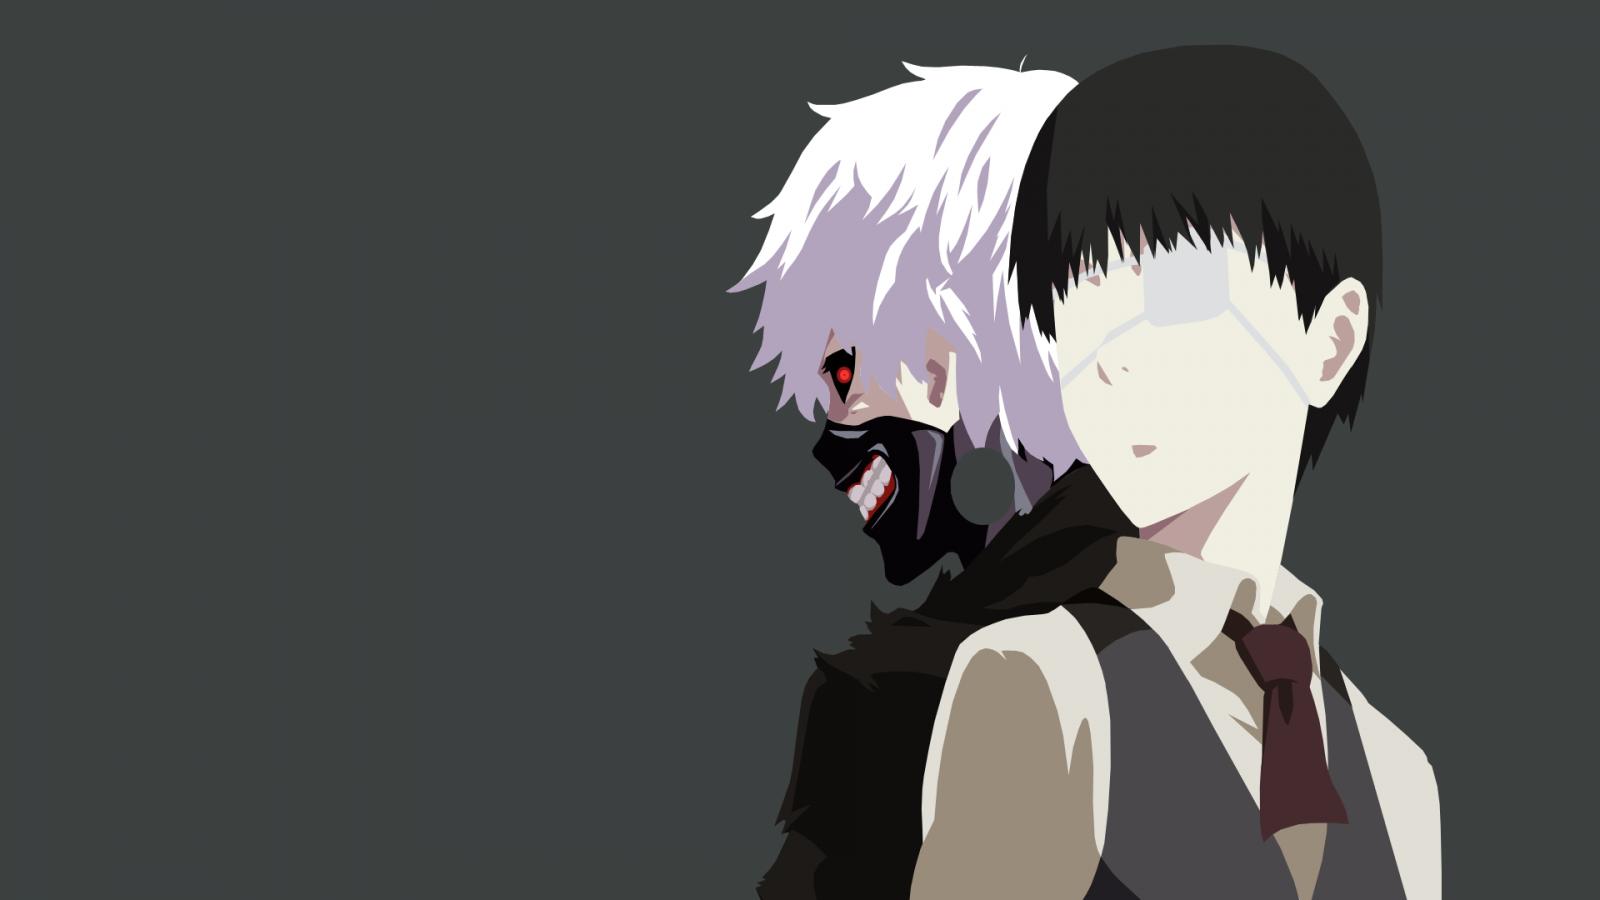 Wallpaper : illustration, monochrome, anime, Kaneki Ken ...